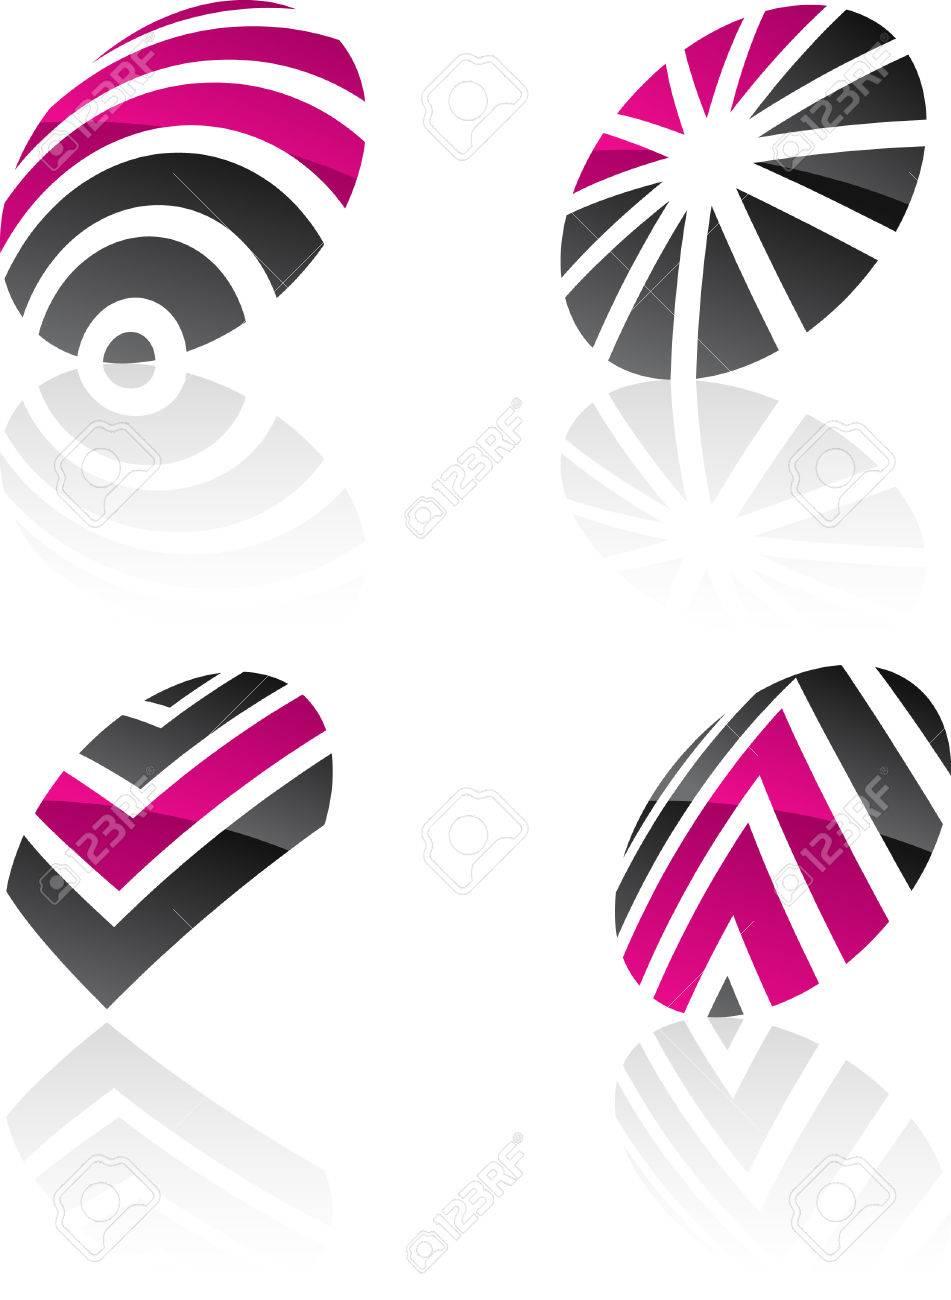 Abstract design symbols. Vector illustration. Stock Vector - 6297193